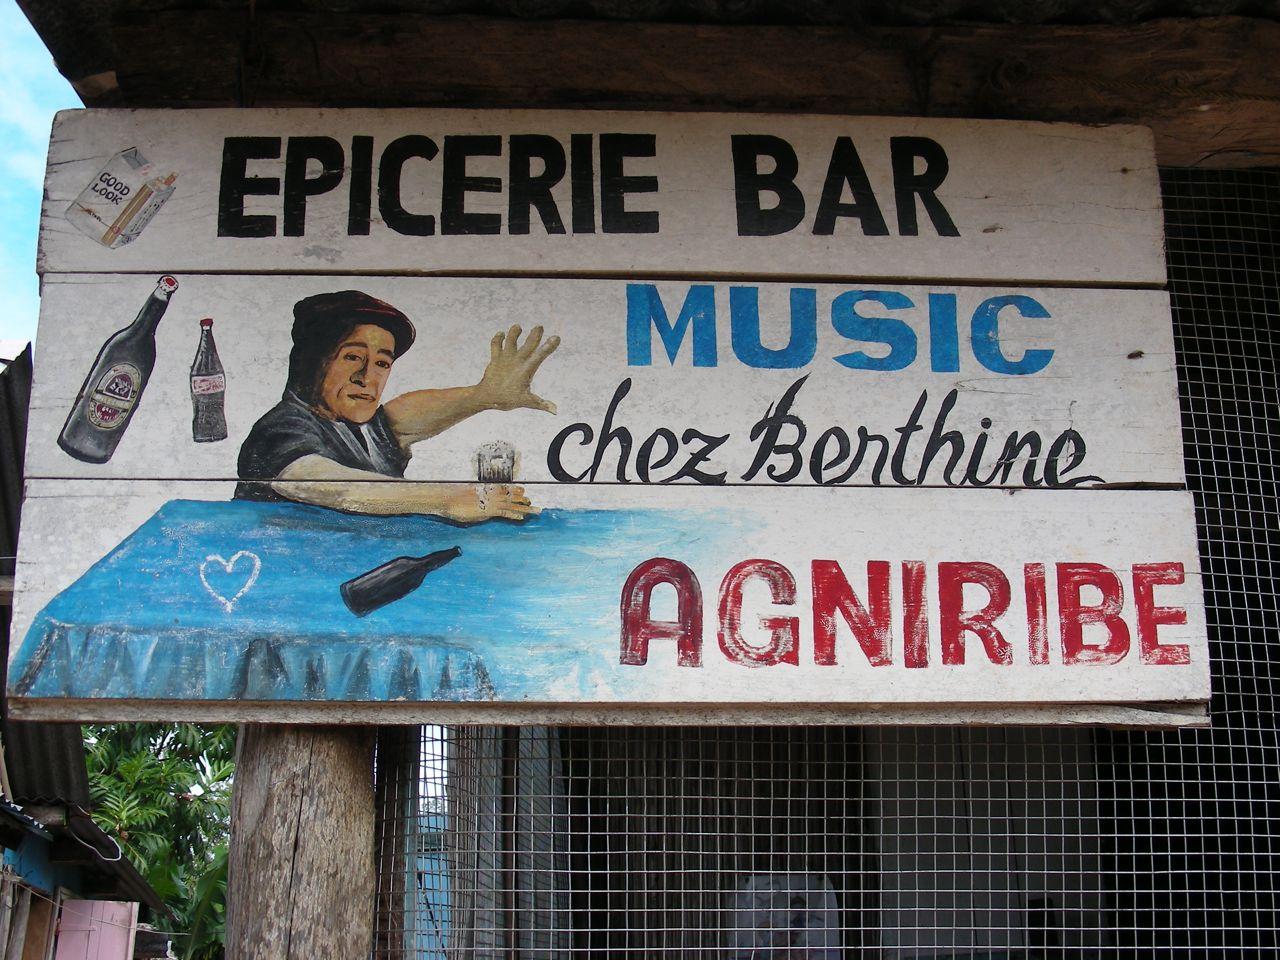 Epicerie bar music